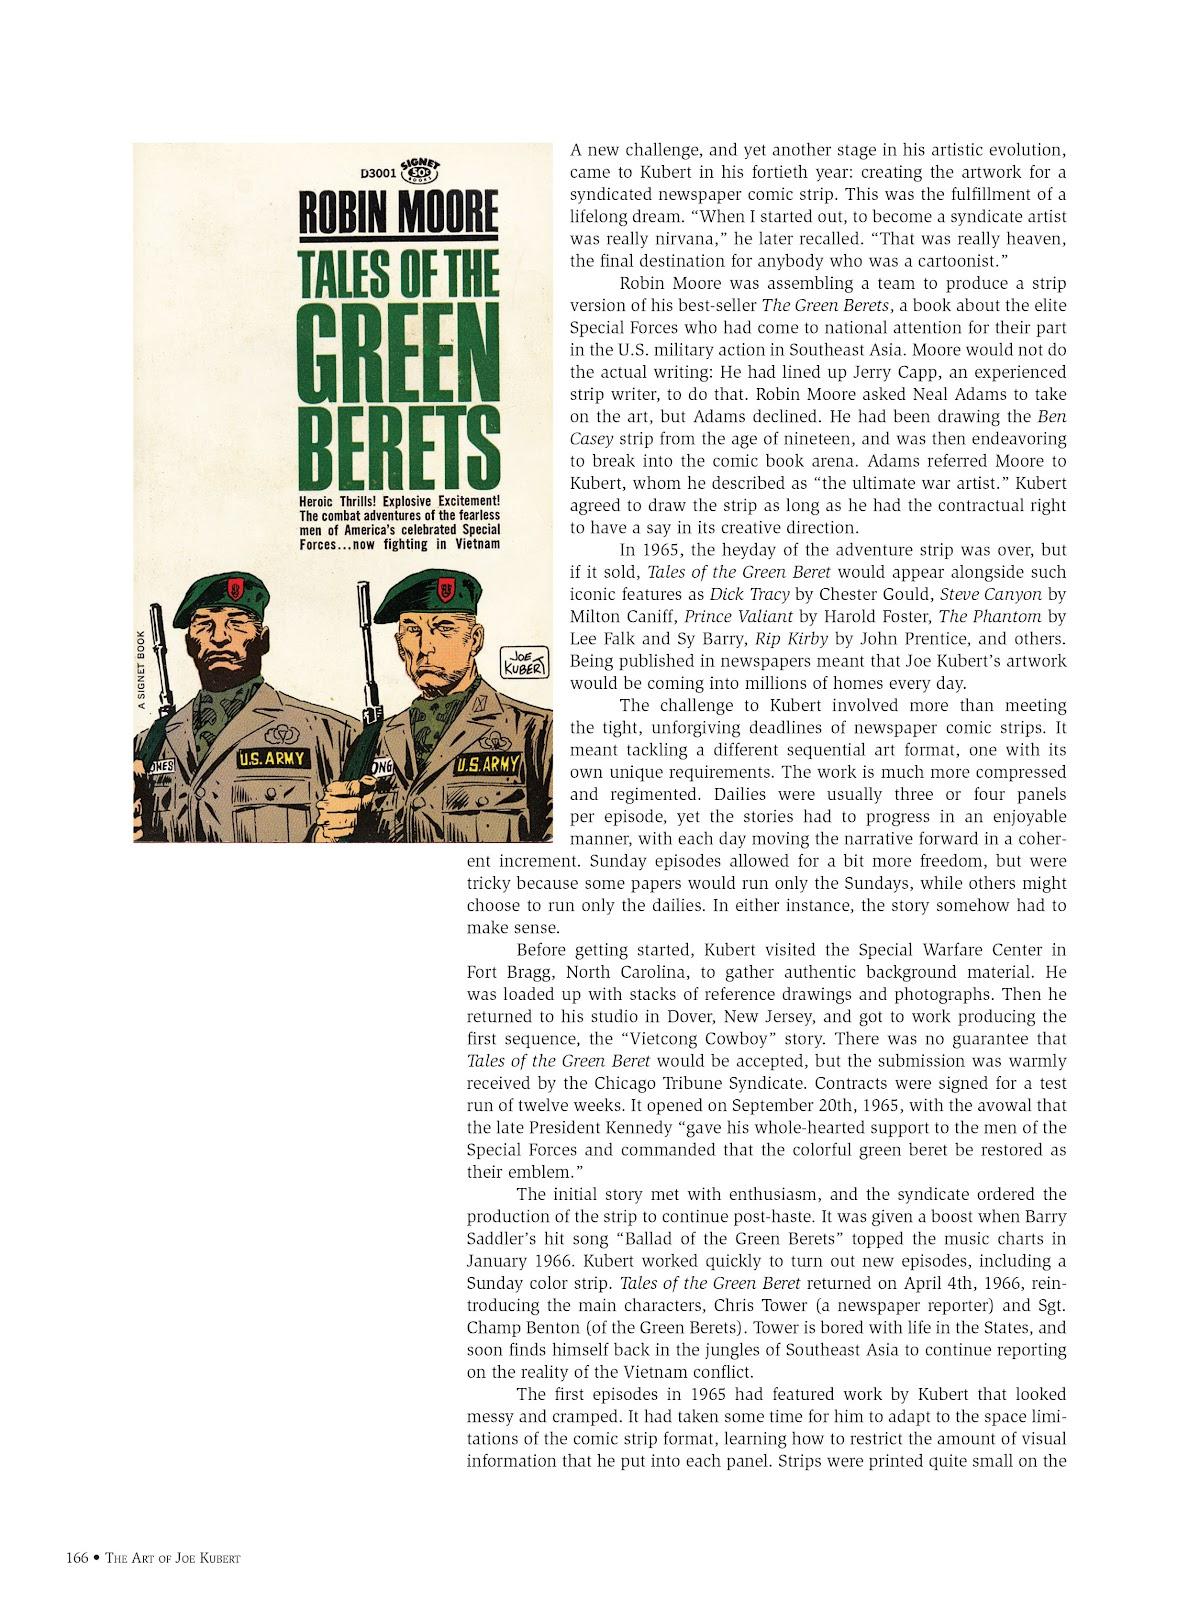 Read online The Art of Joe Kubert comic -  Issue # TPB (Part 2) - 66